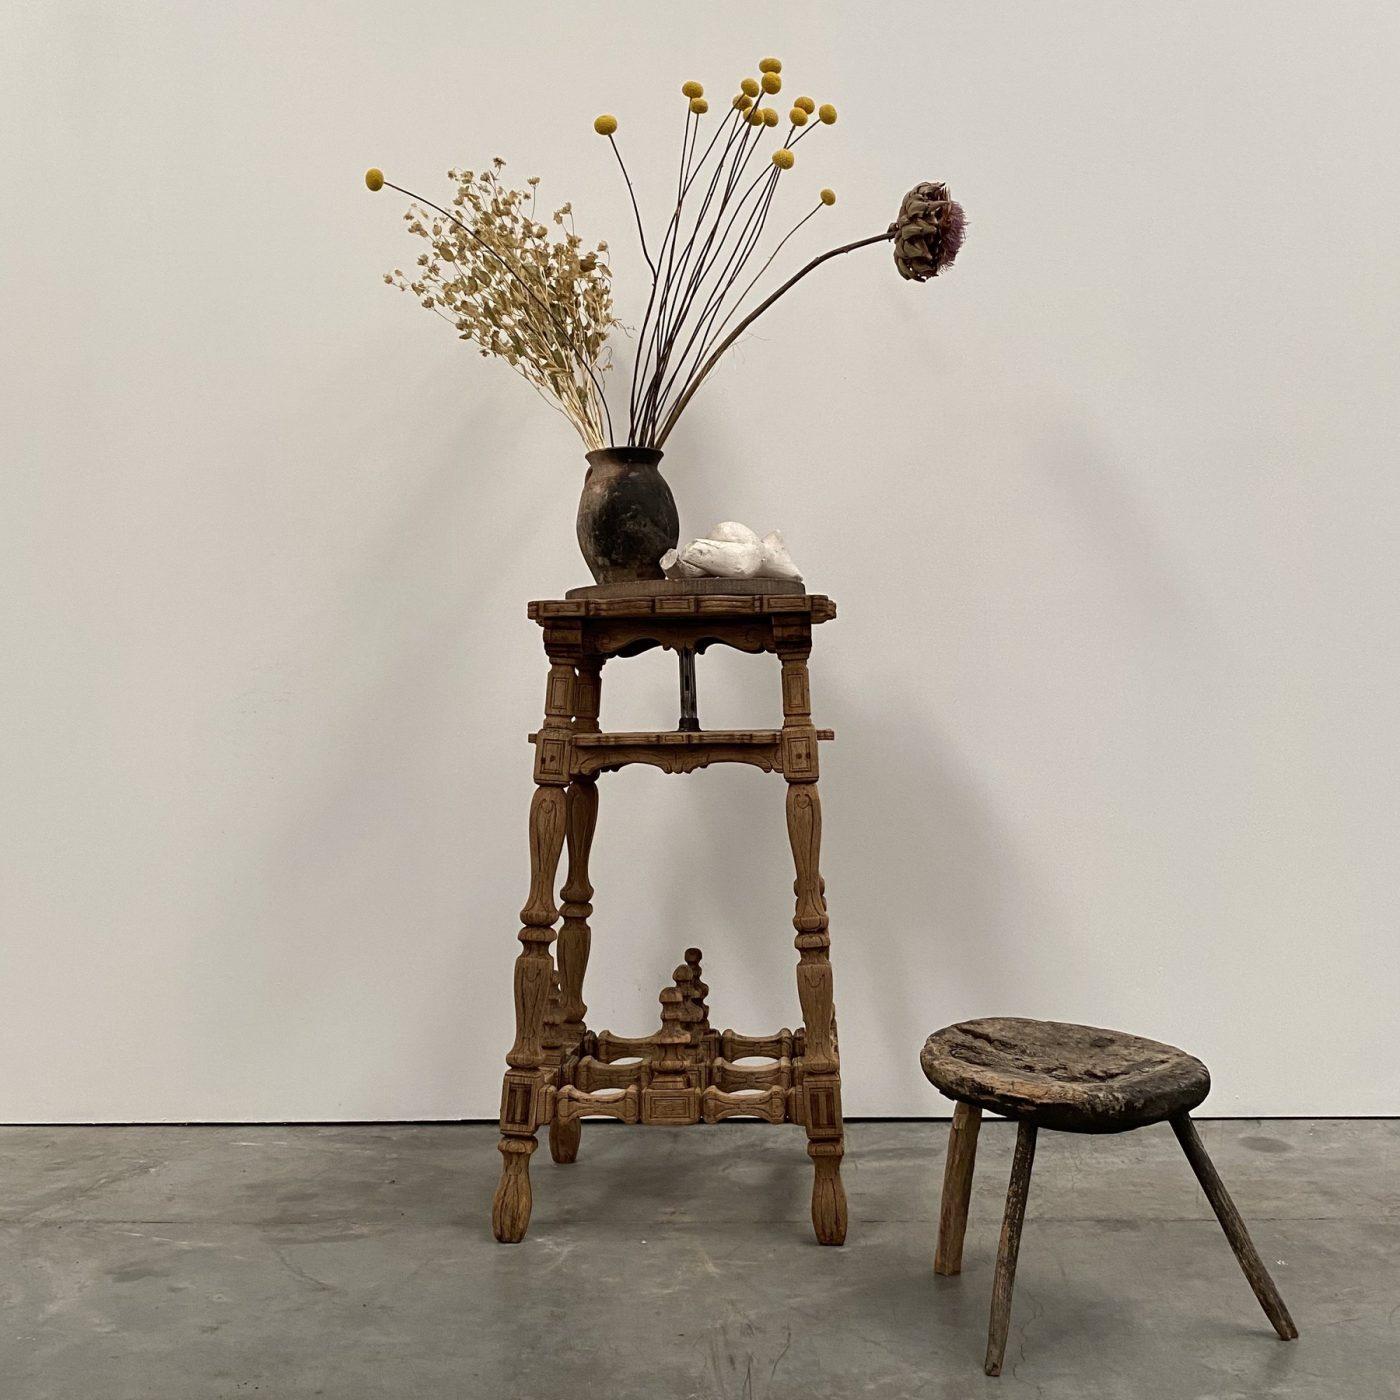 objet-vagabond-sculptor-table0006